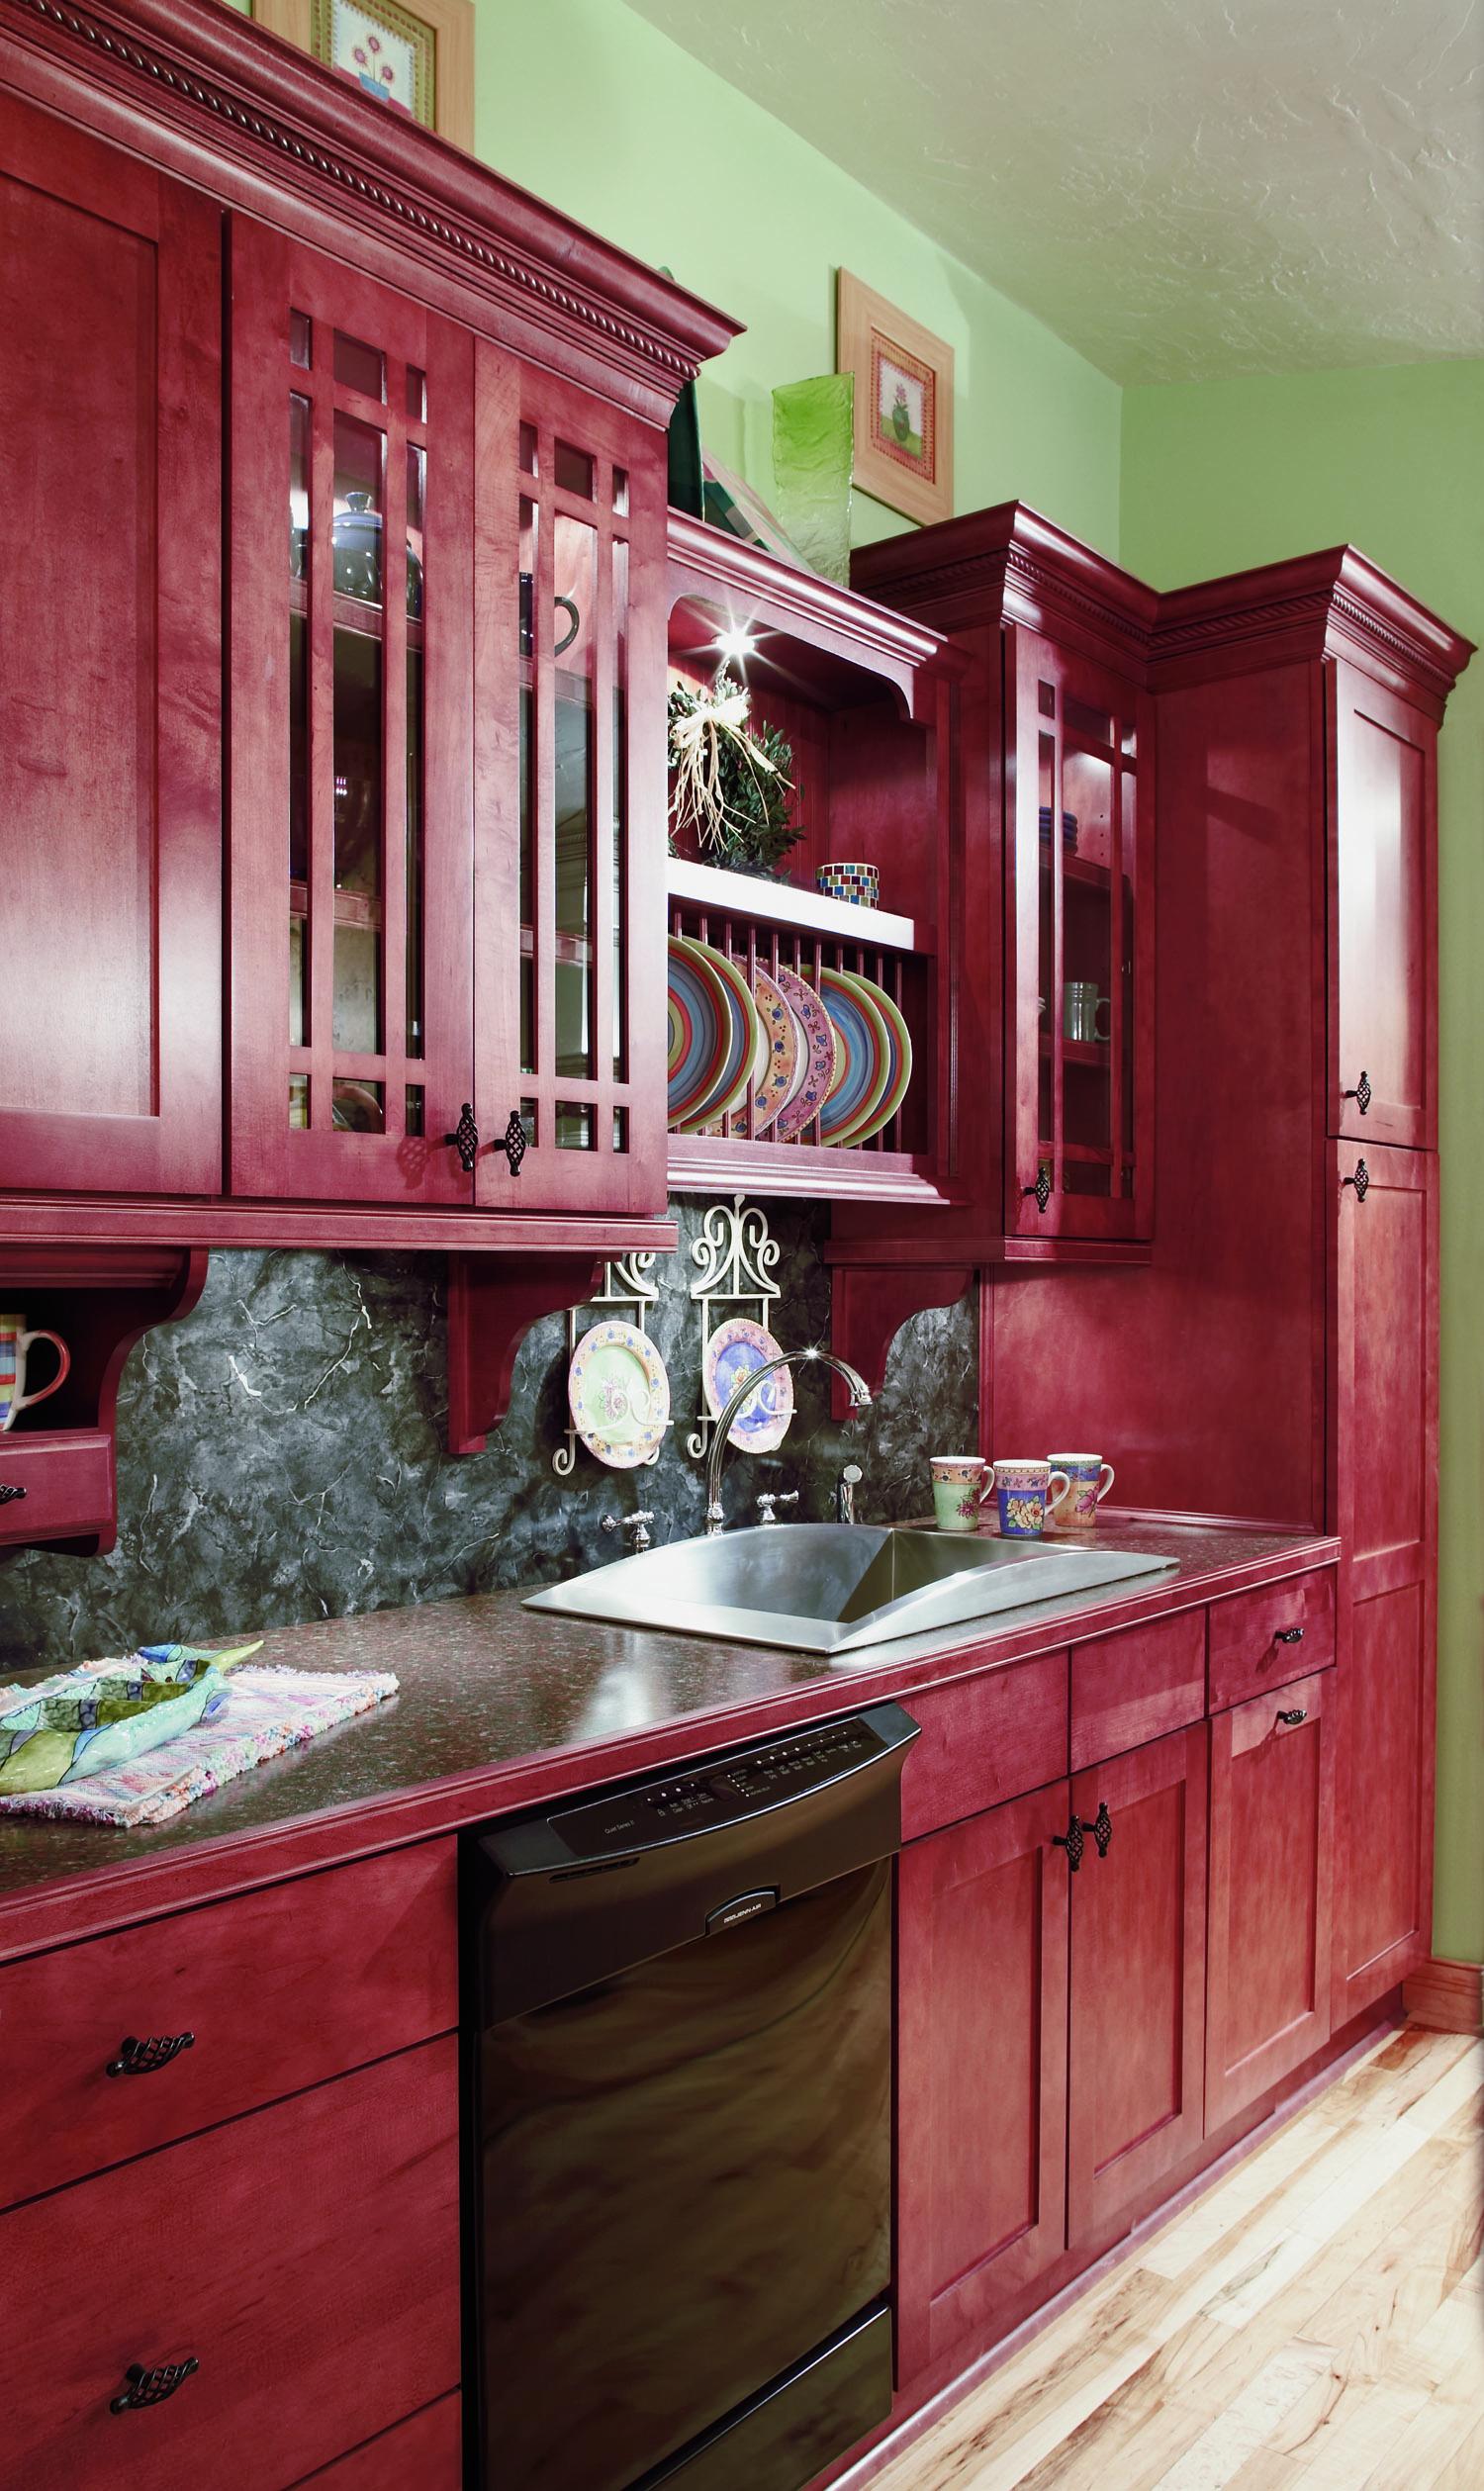 PRA_MPL_TEA Kitchen.jpg